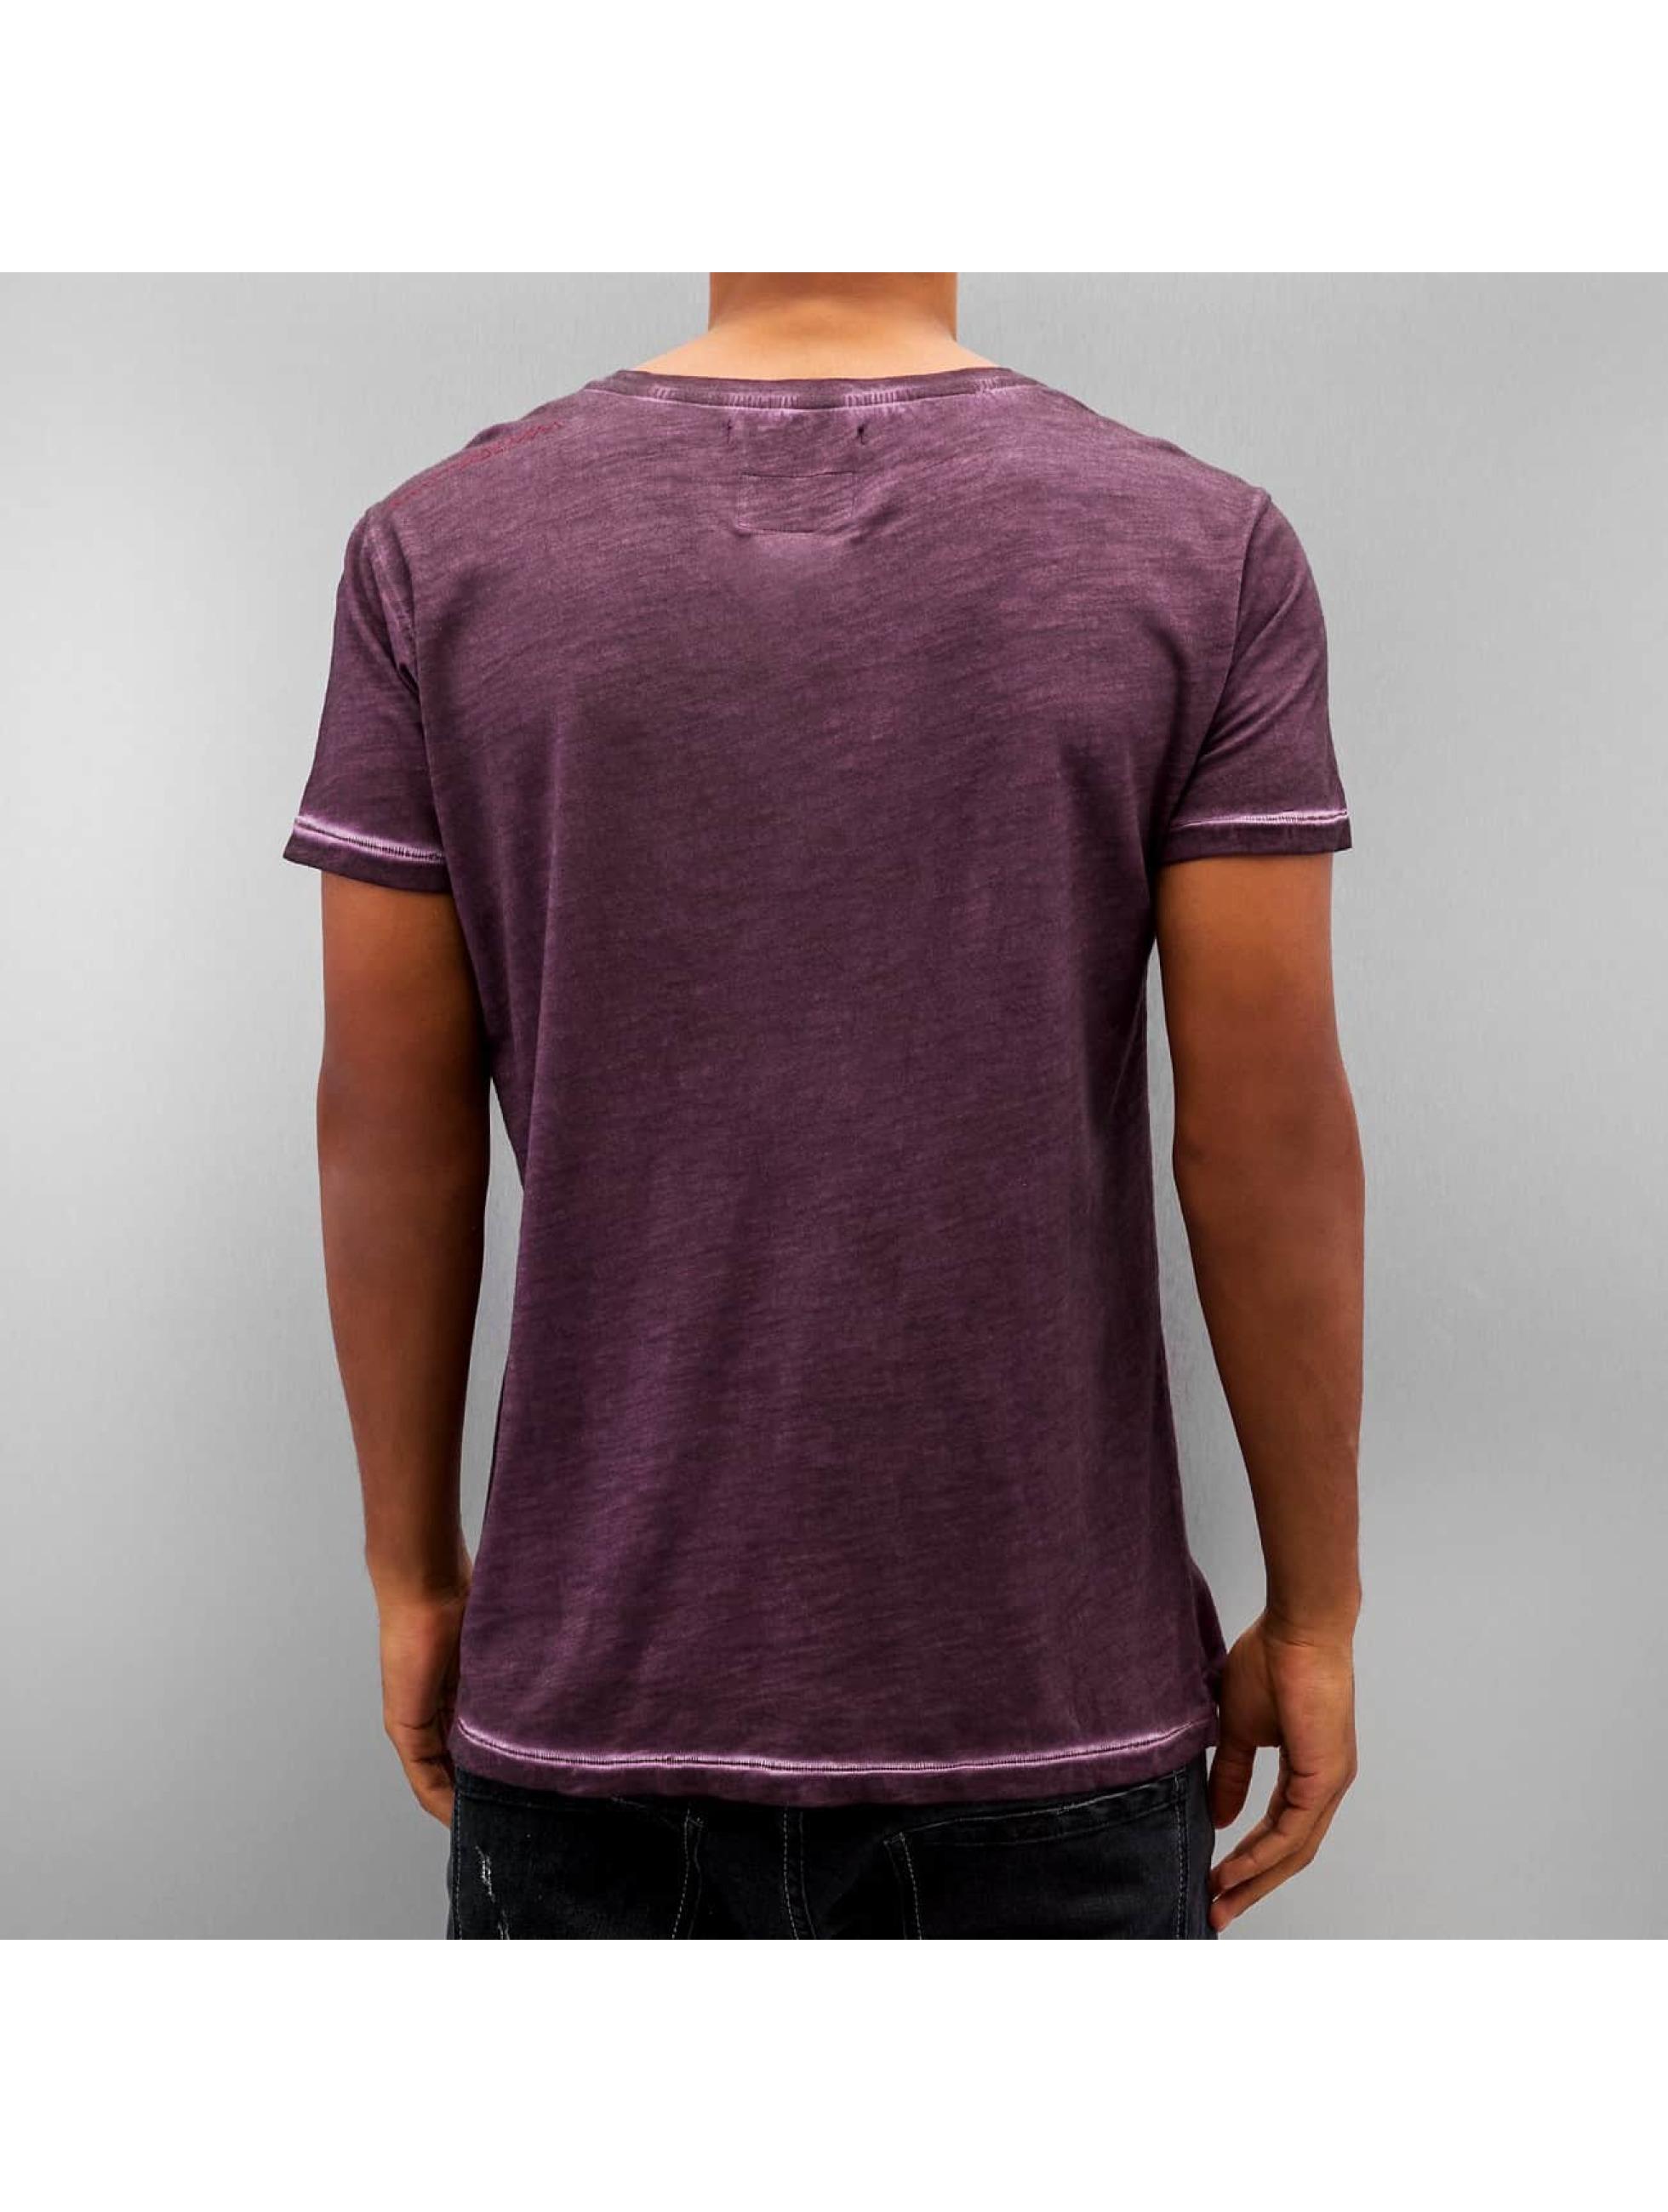 Amsterdenim T-paidat Tom punainen